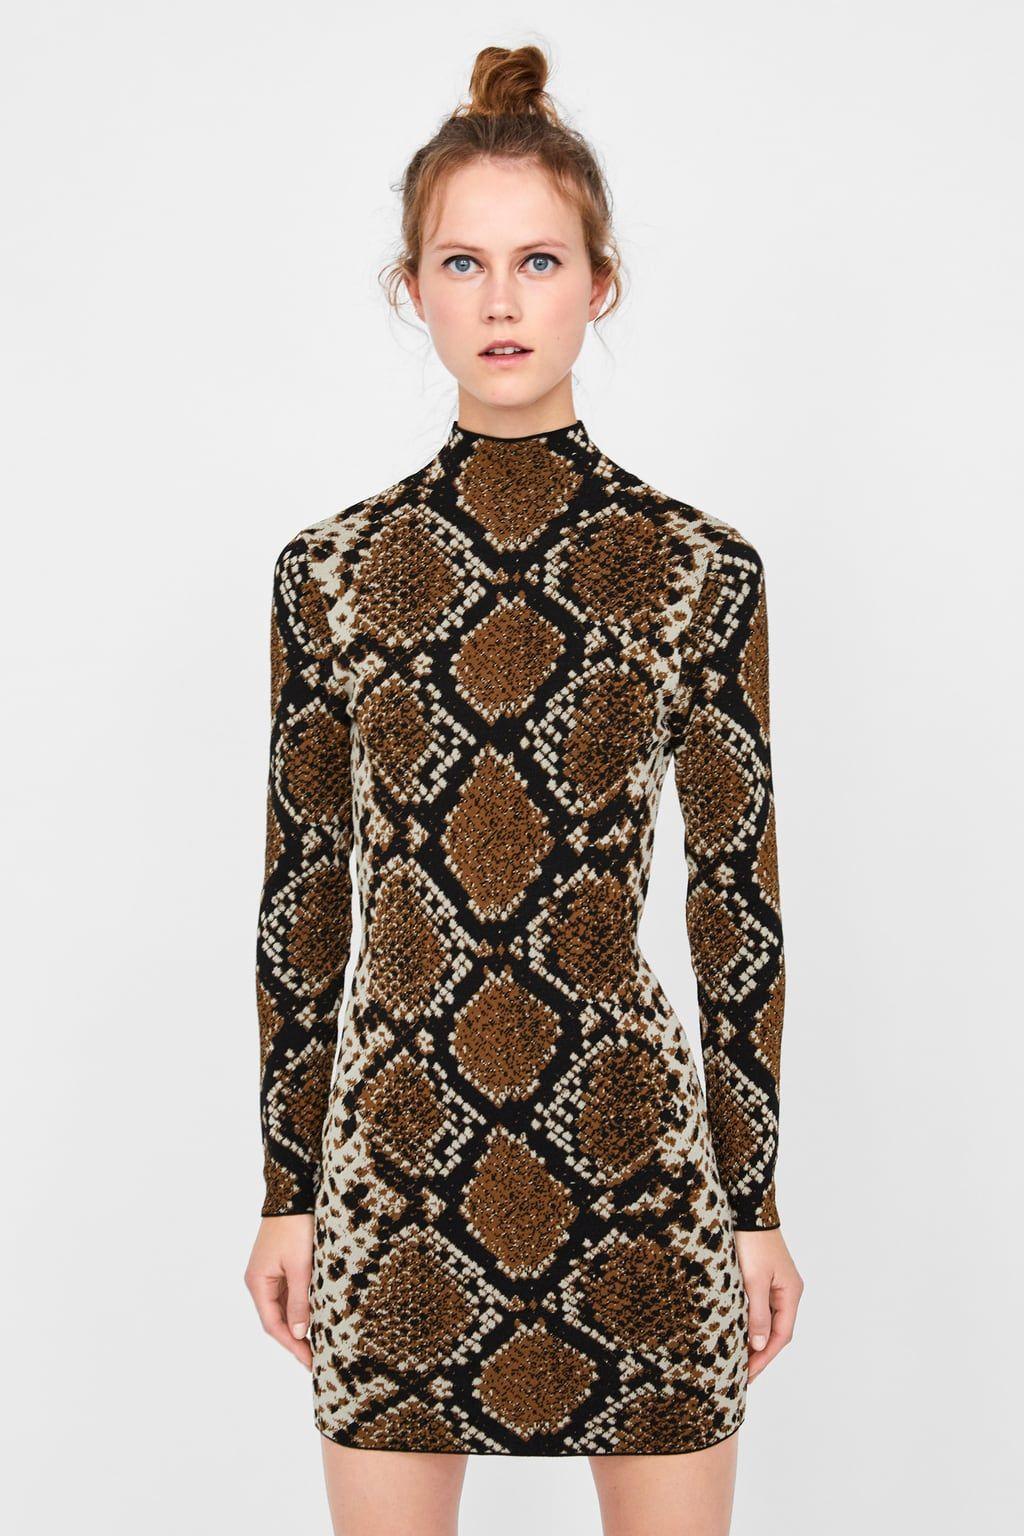 7f69caf877a15c Image 4 of SNAKESKIN PRINT JACQUARD DRESS from Zara